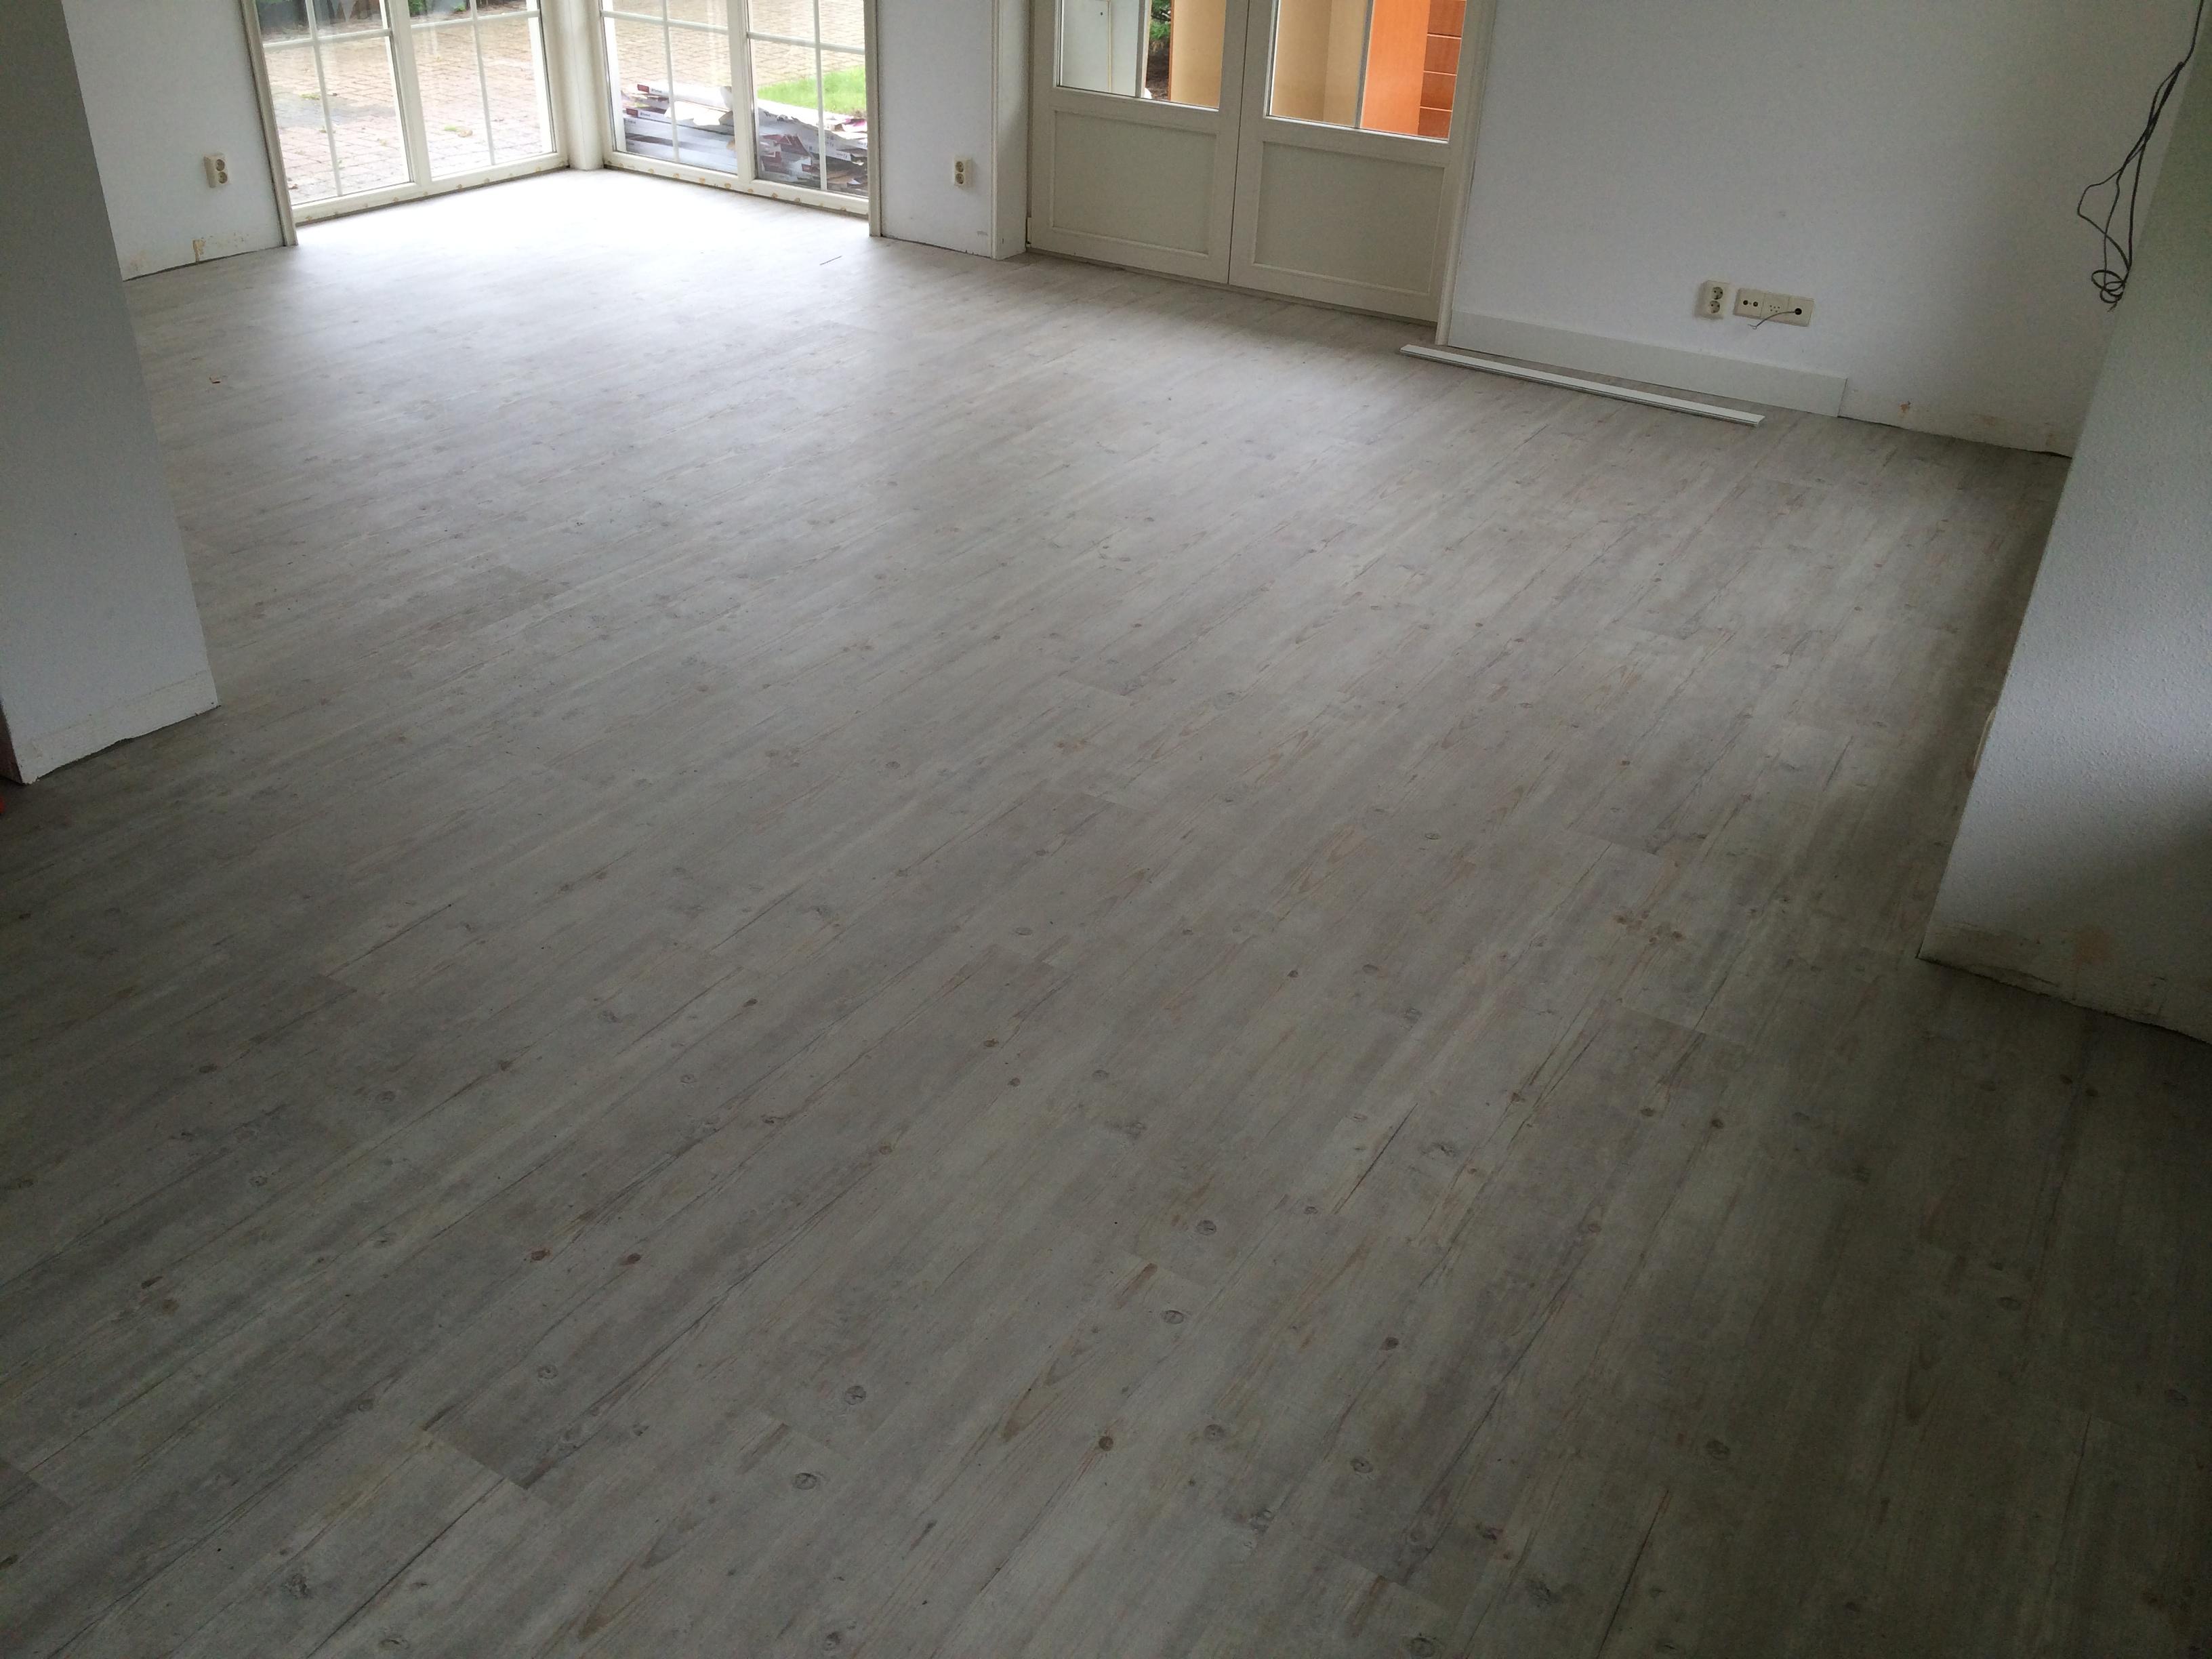 Pvc Vloeren Leiden : Pvc vloeren en laminaat parket vloer schuren leiden